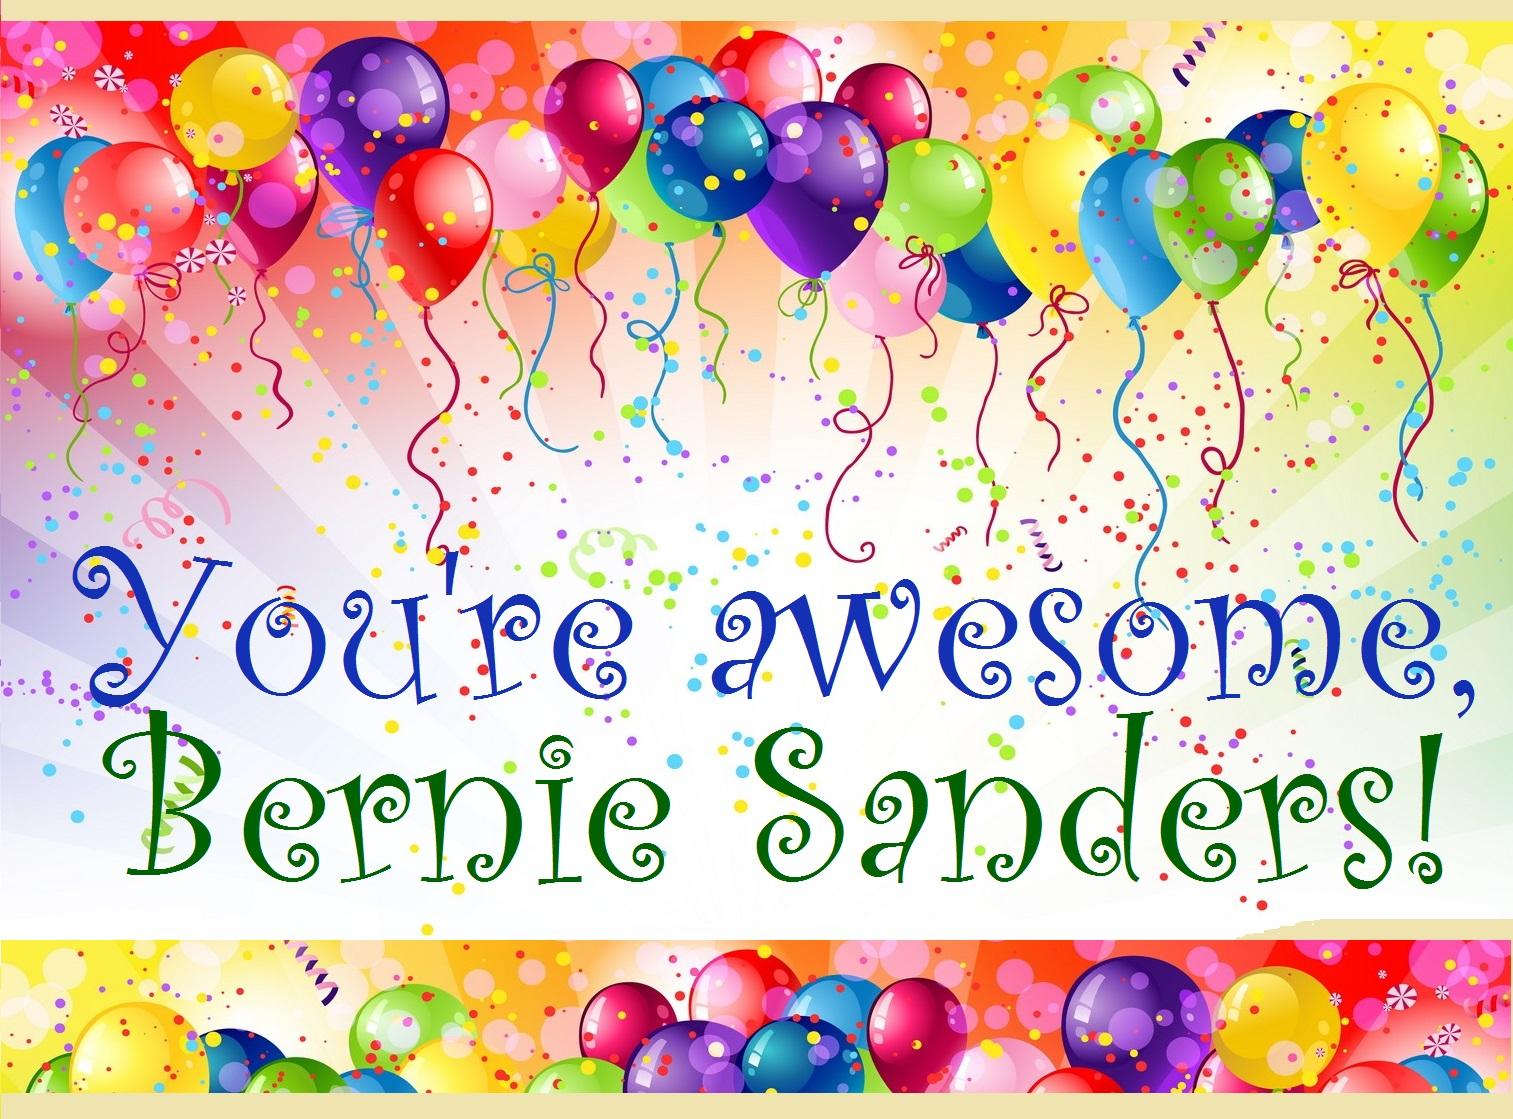 celebrate Bernie Sanders!